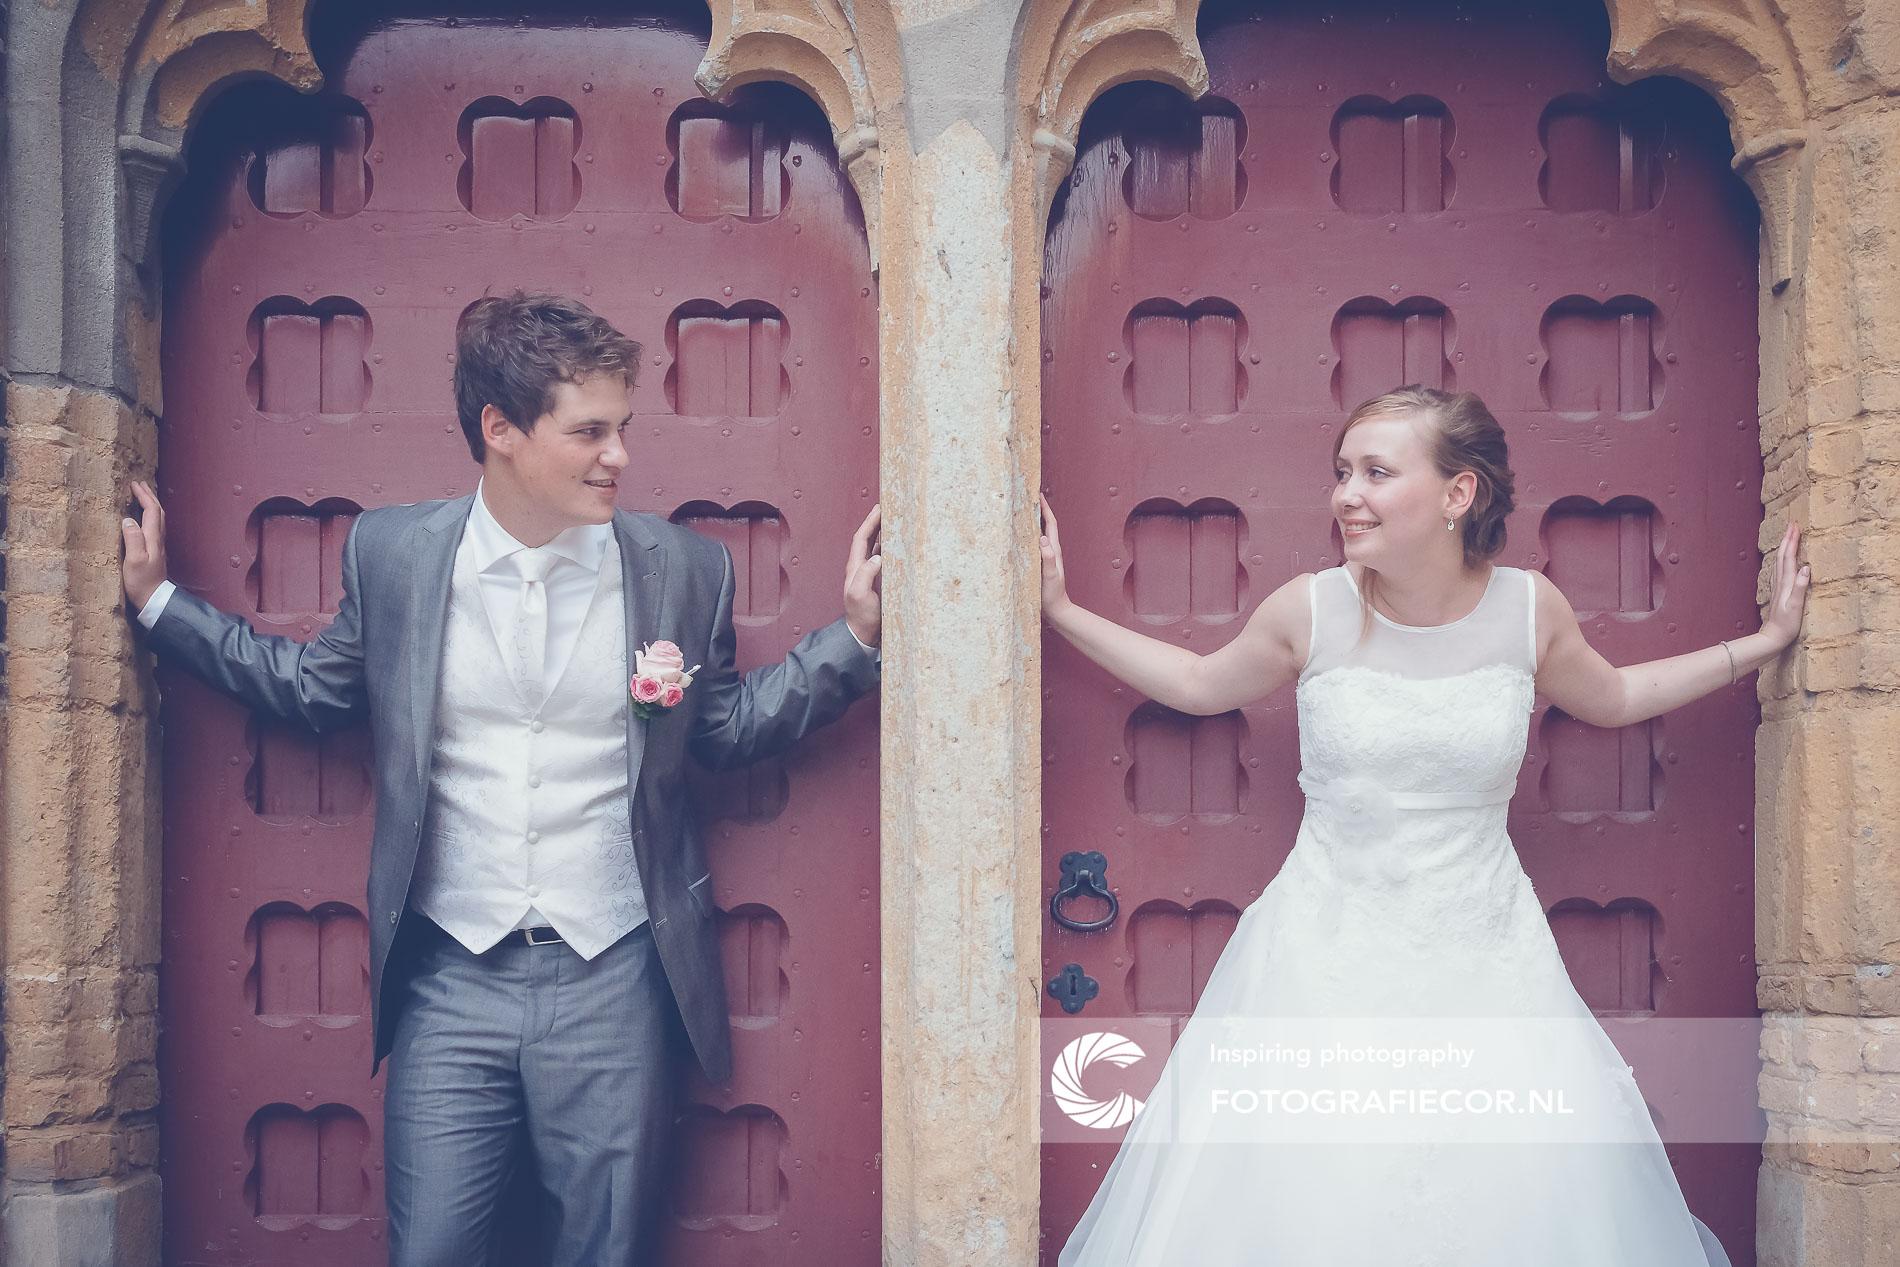 Trouwfoto's | Bruidsfotografie | Portret | trouwfotograaf | bruidspaar | bruidsreportage | weddingshoot